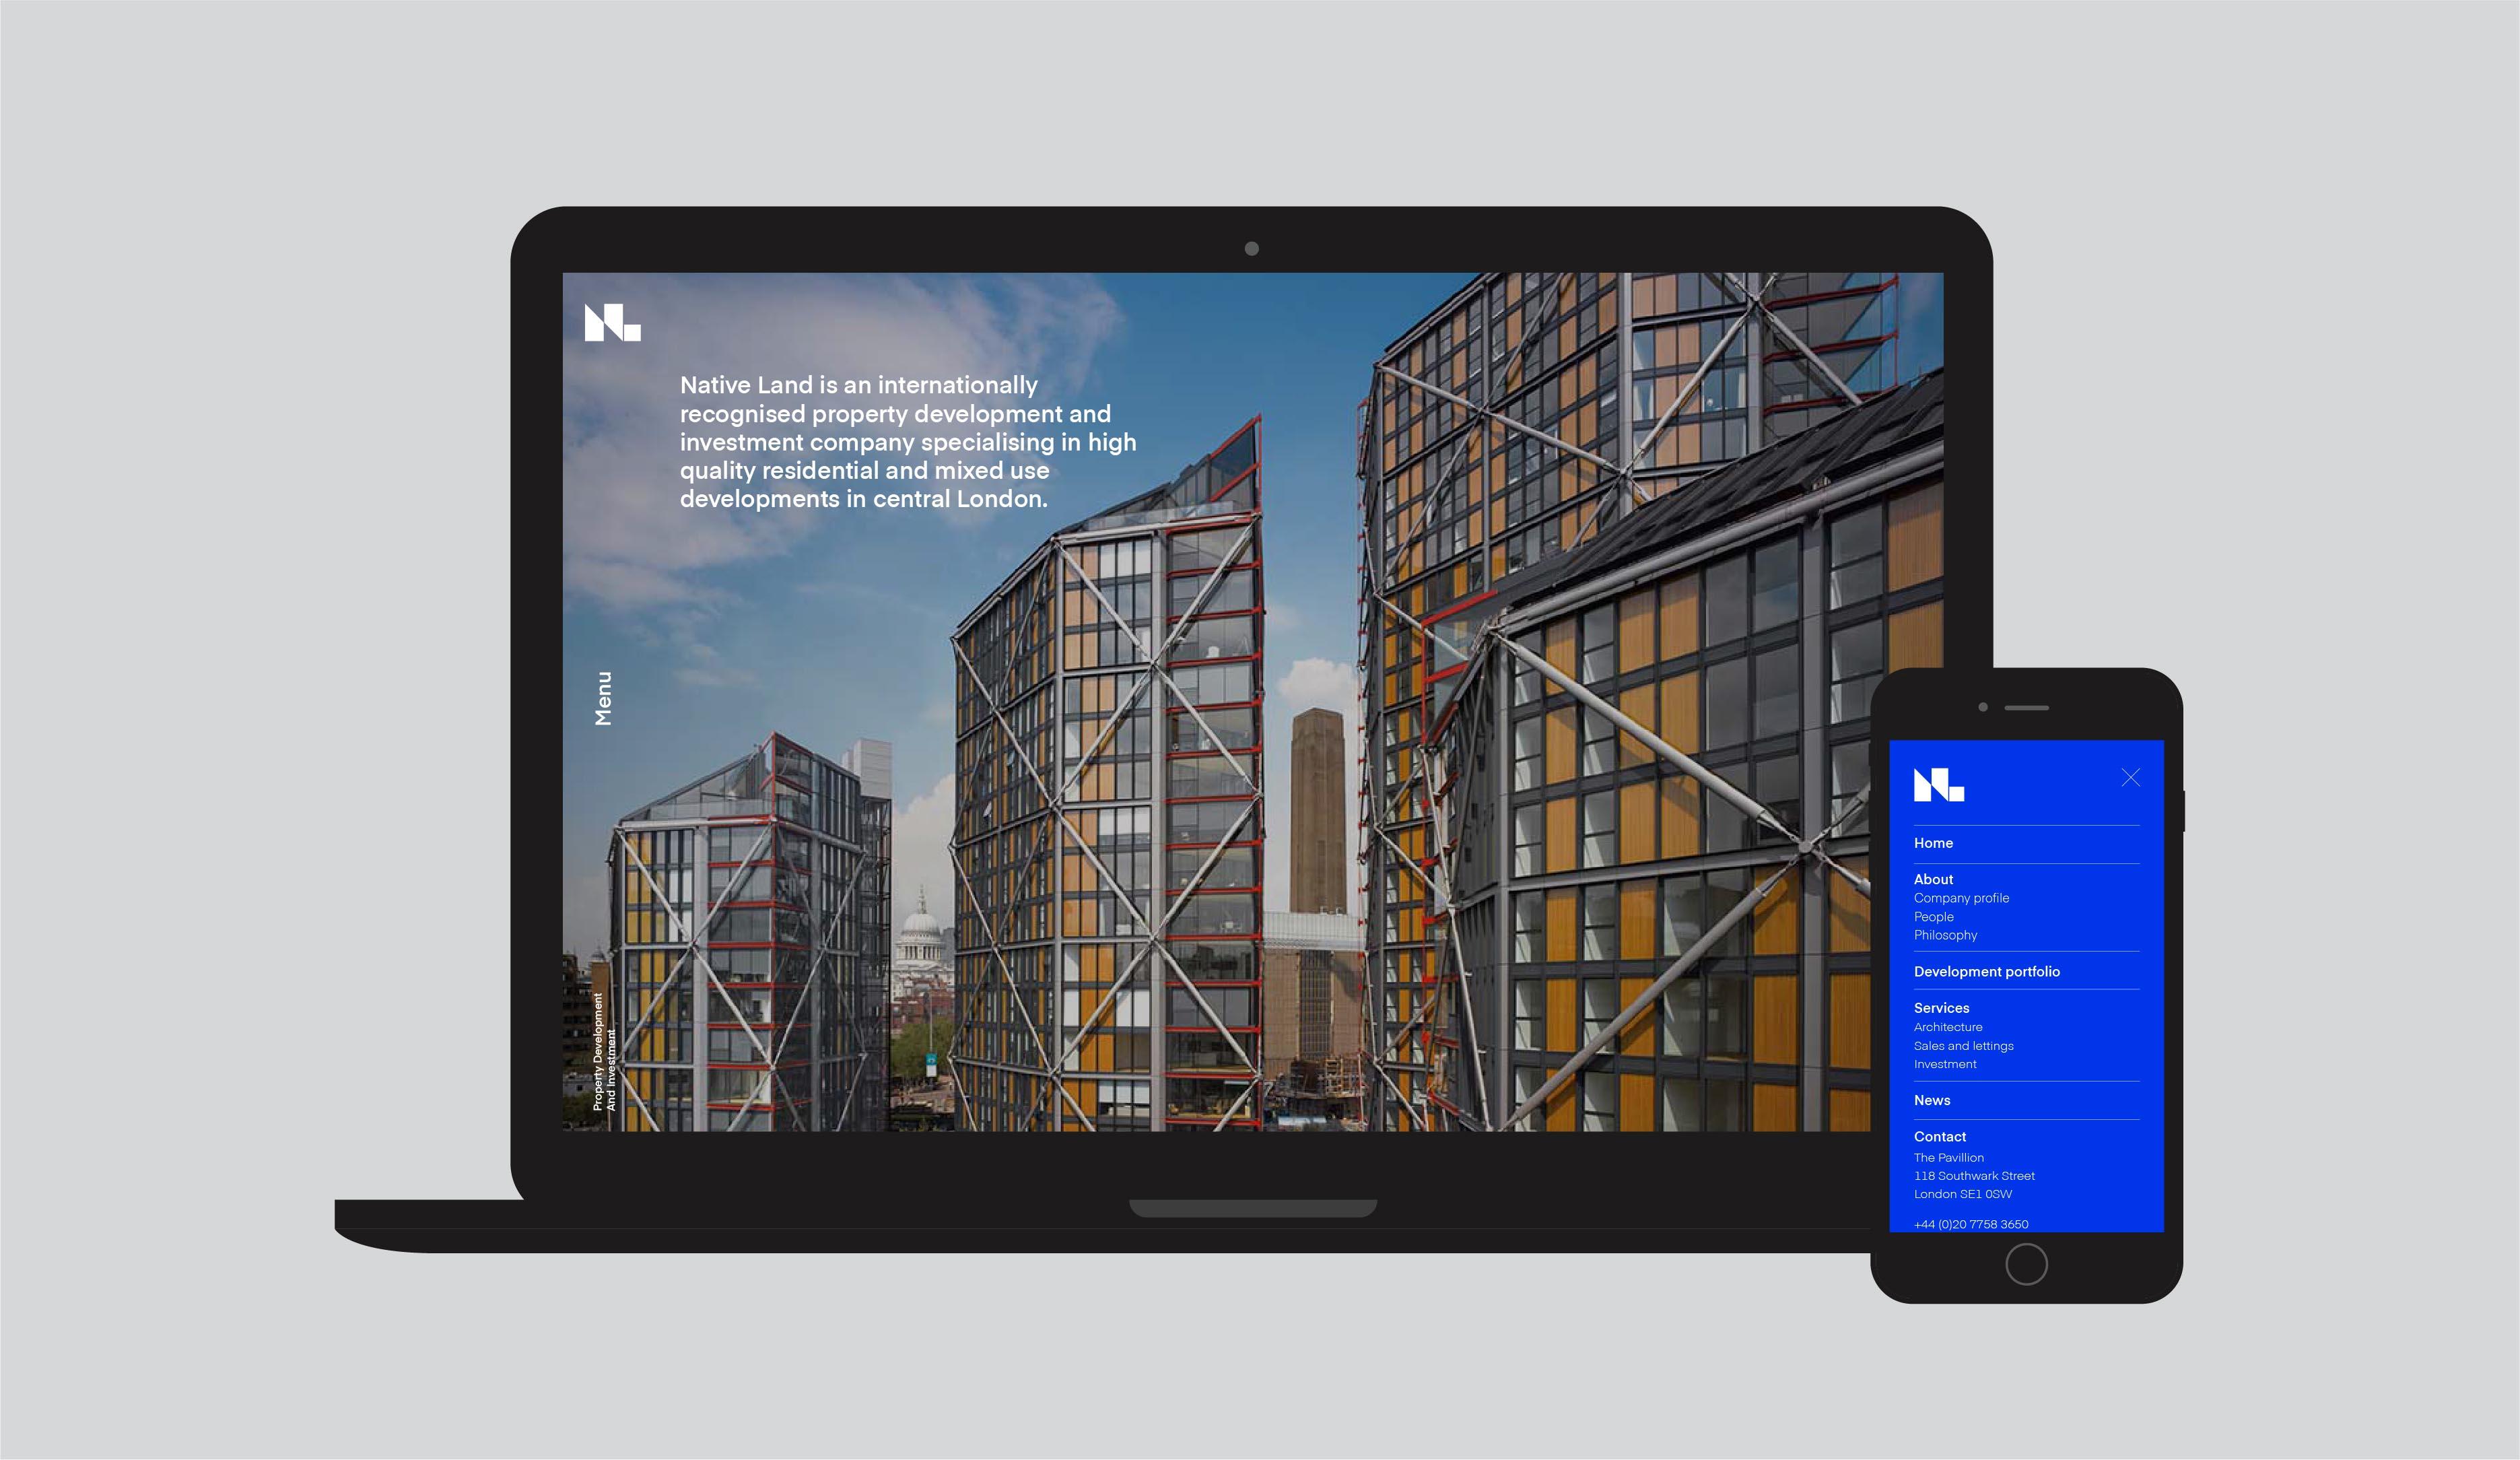 Native Land property development website design